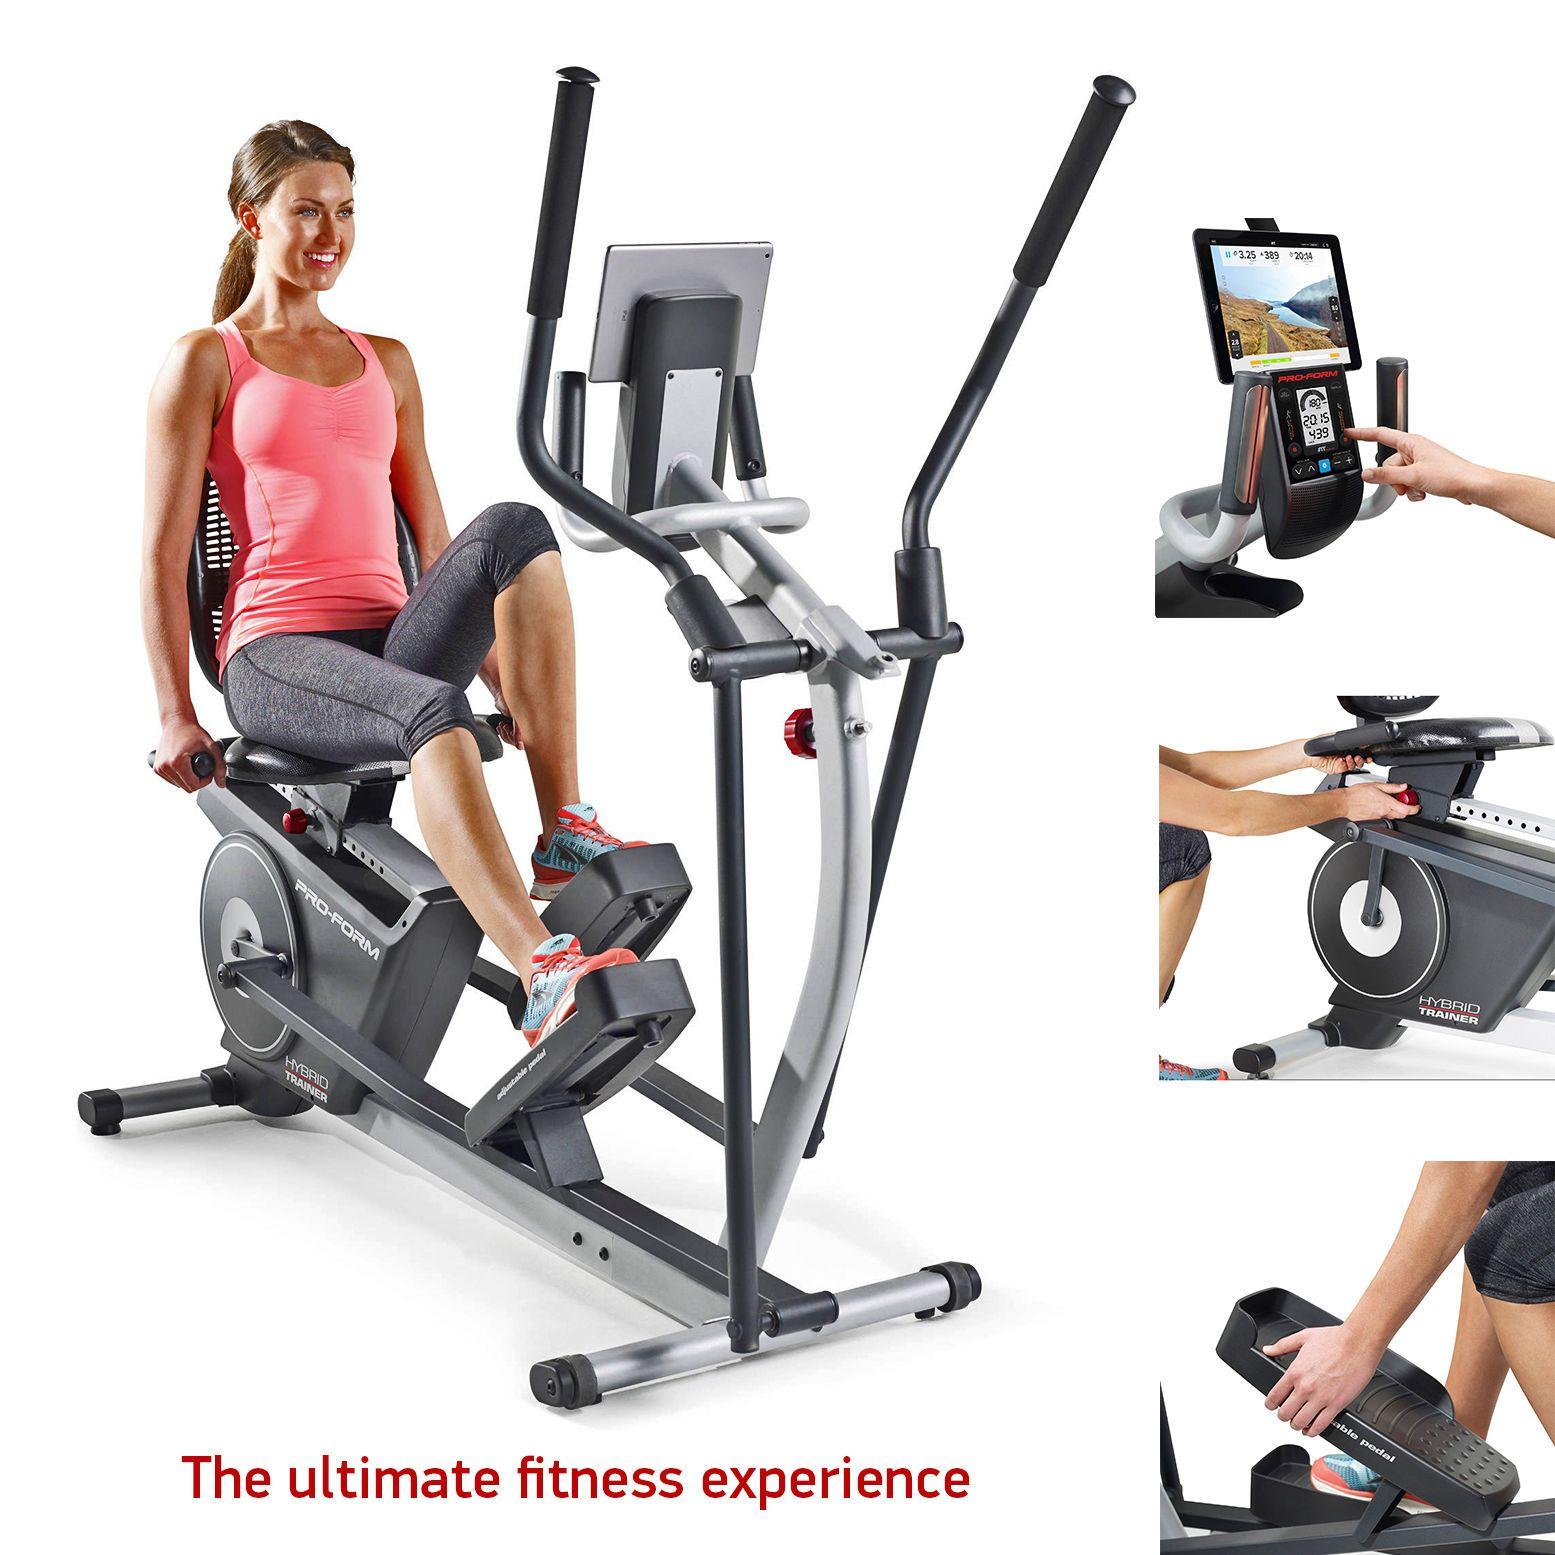 Elliptical recumbent bike 2in1 hybrid gym trainer